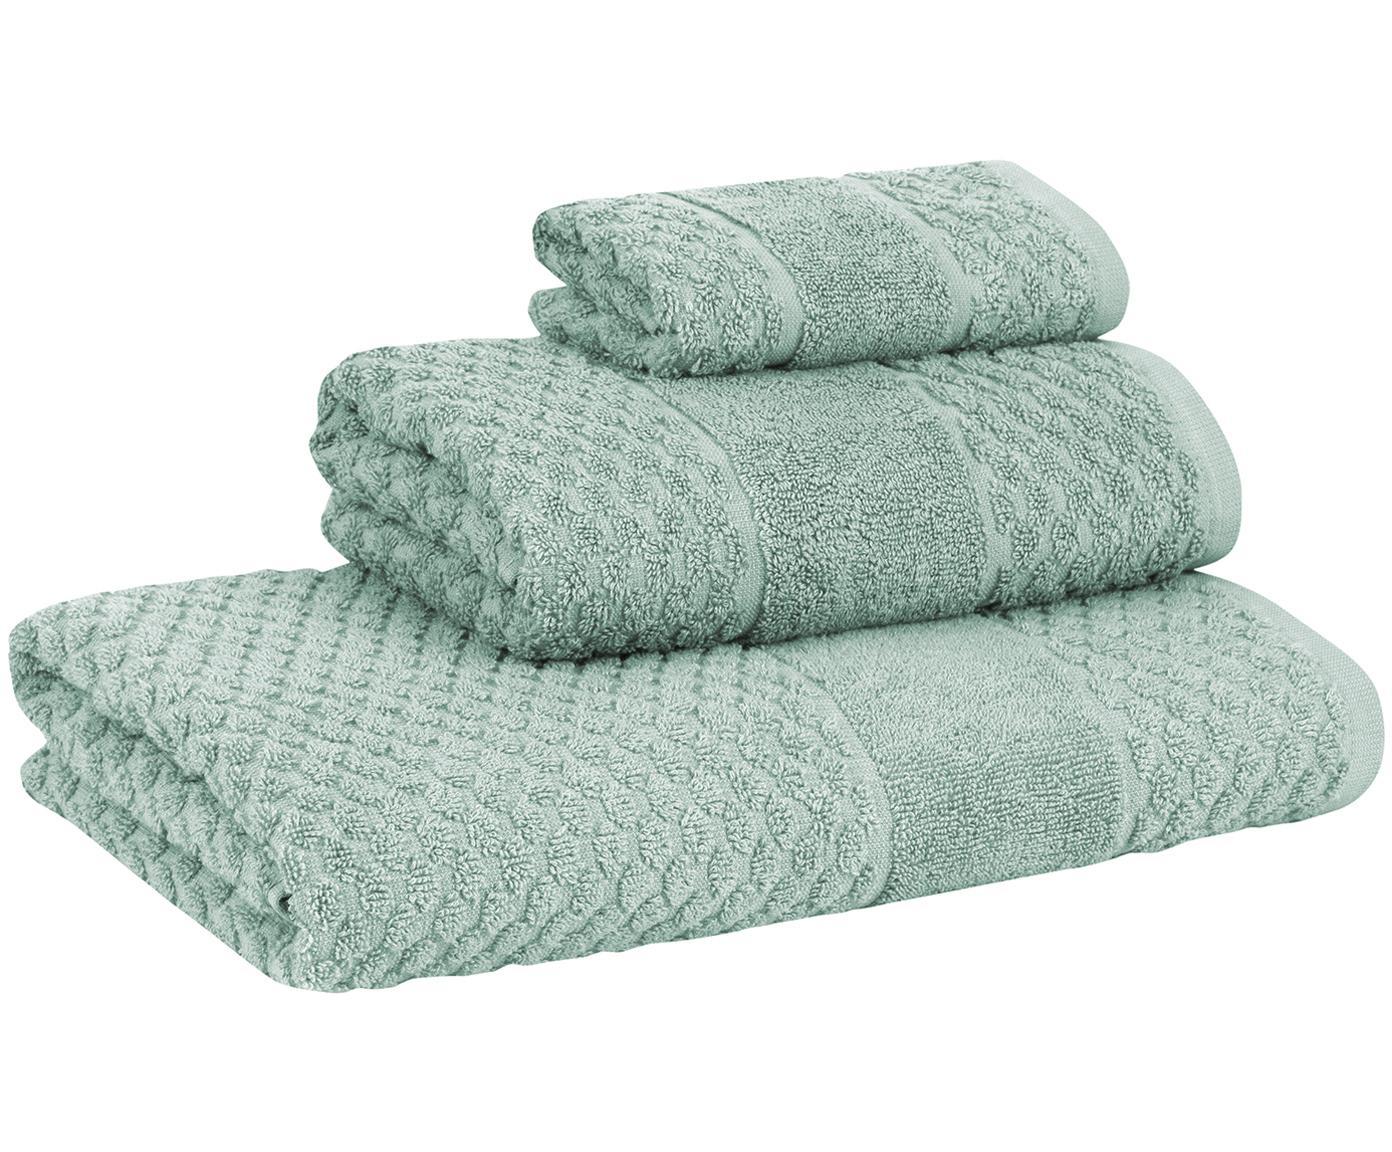 Set de toallas texturizada Katharina, 3pzas., Verde menta, Tamaños diferentes